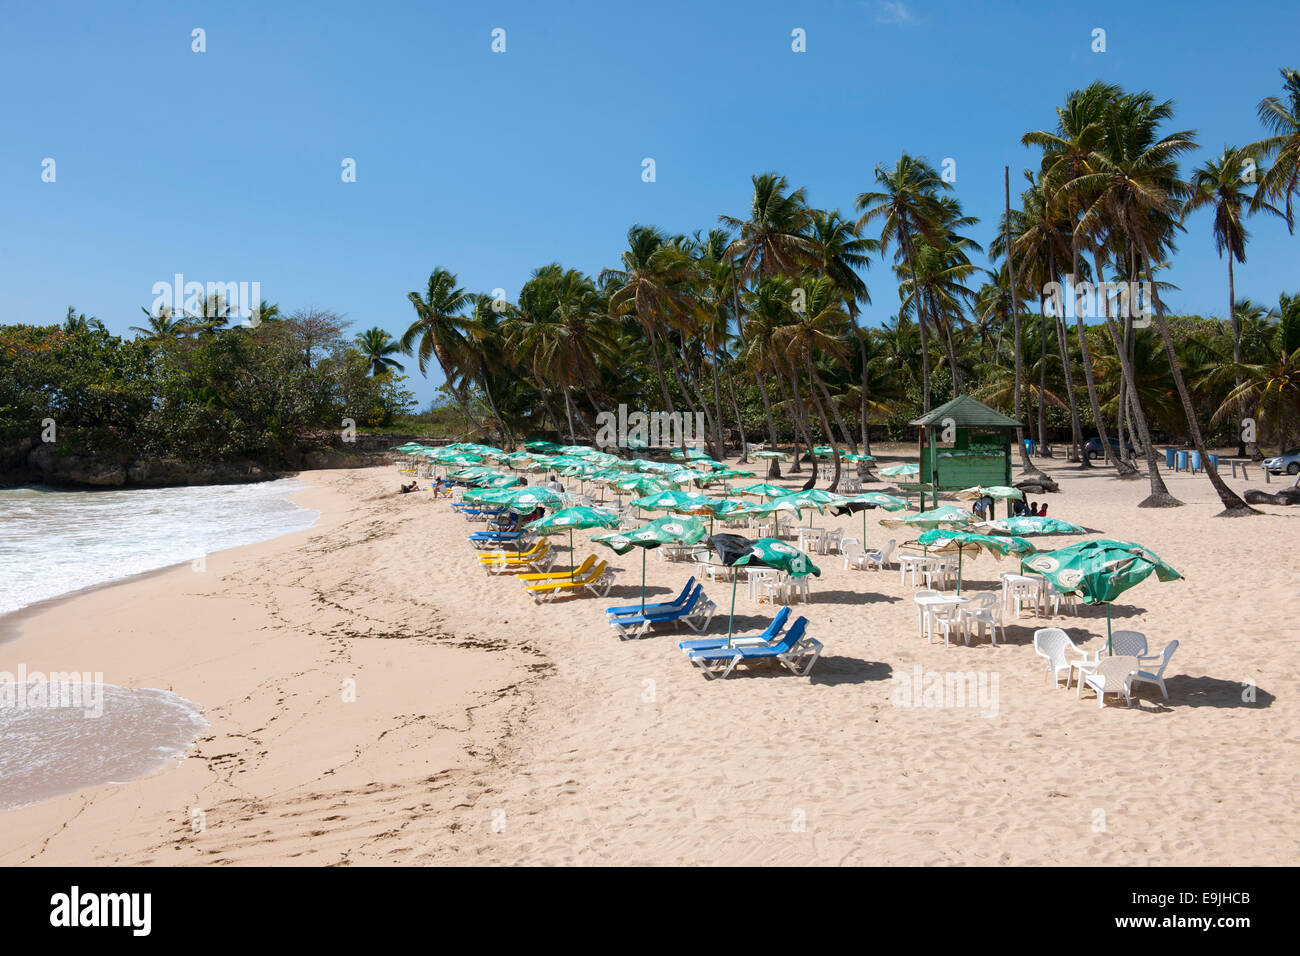 Dominikanische republik, osten, Juan Dolio, playa caribe Foto de stock